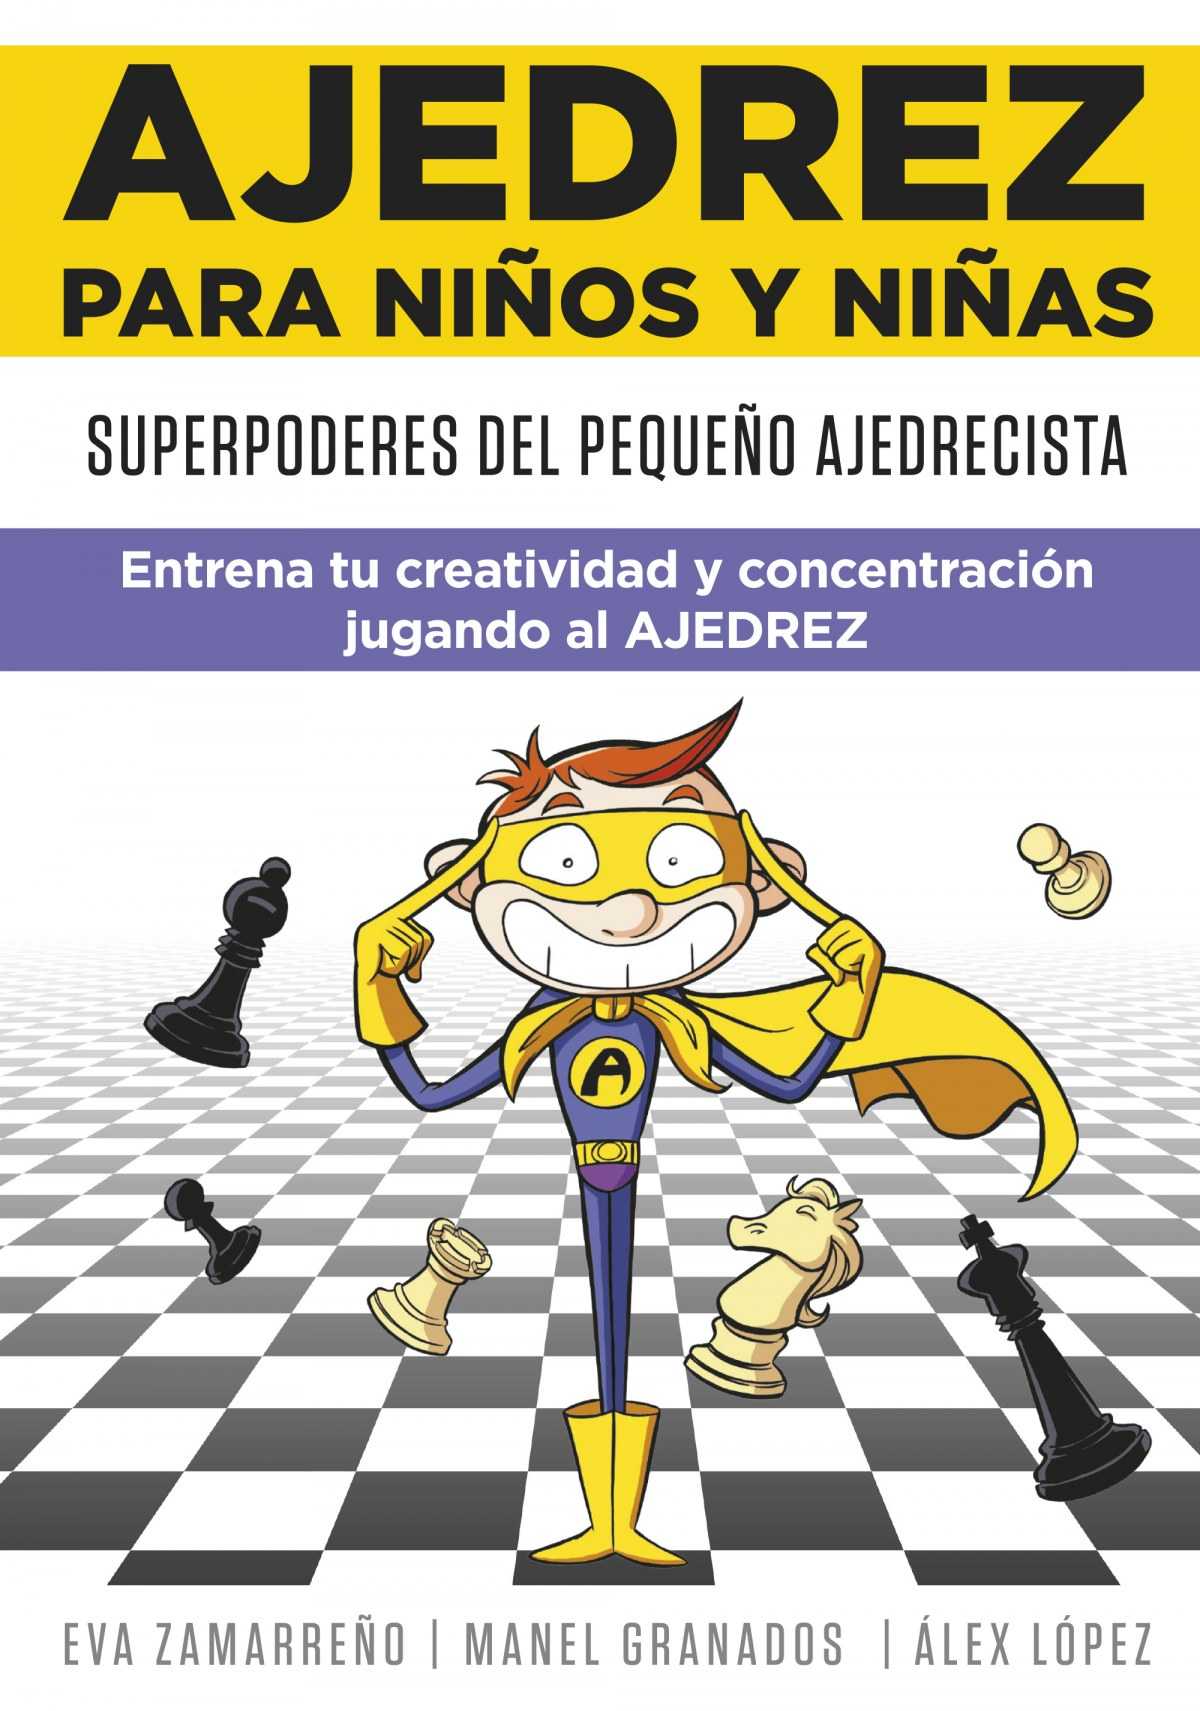 Superpoderes del pequeño ajedrecista 9788418594113